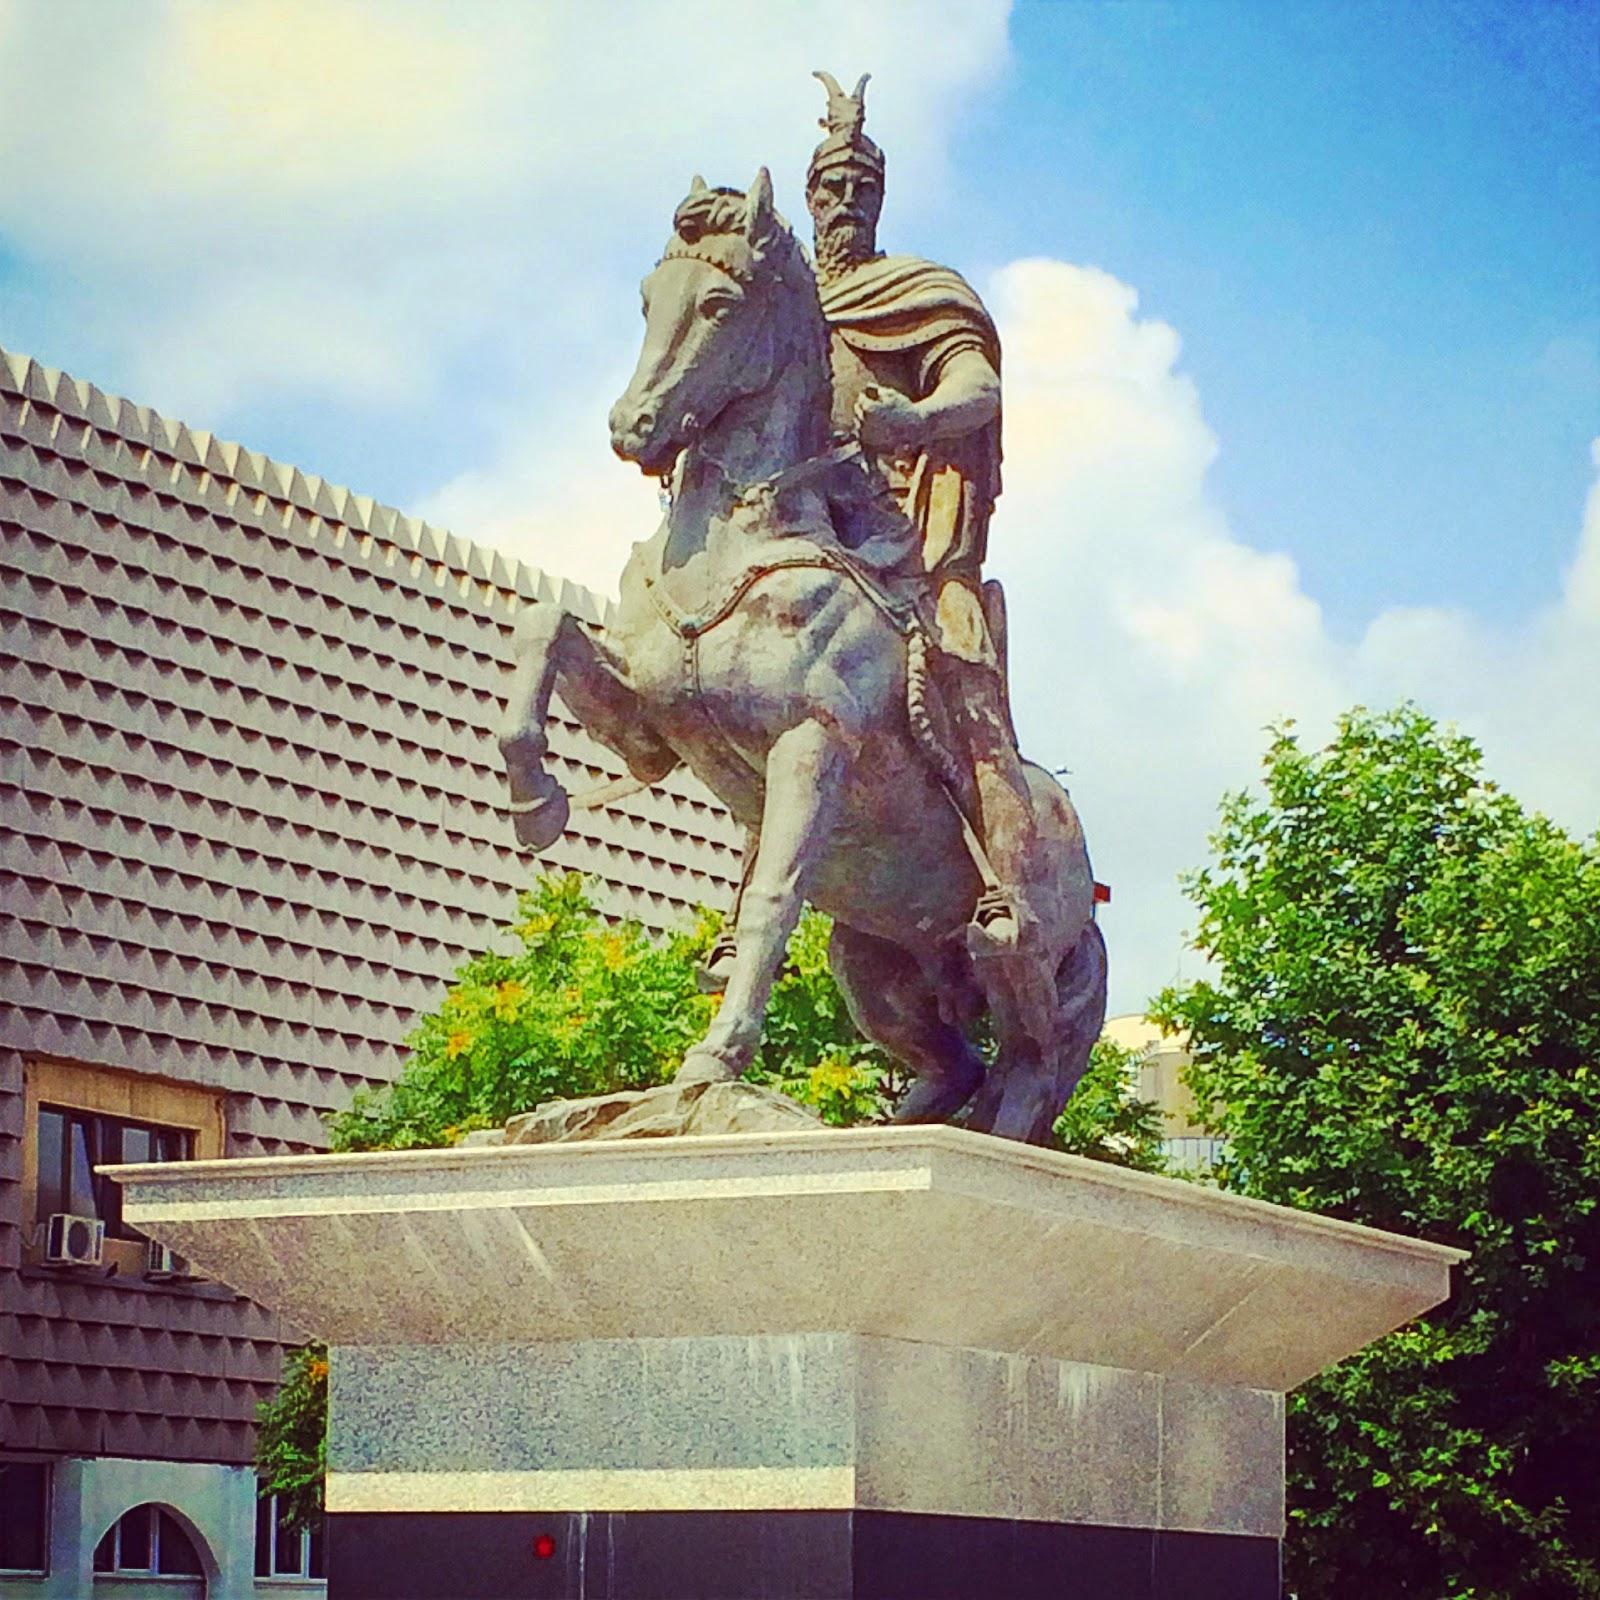 Skenderbeu, Skenderbeg, Held,  Albanien, Kosovo, Krieg, Osmanen, Skenderbeu, Skenderbeg, hero, Albania, Kosovo, War, Ottomans